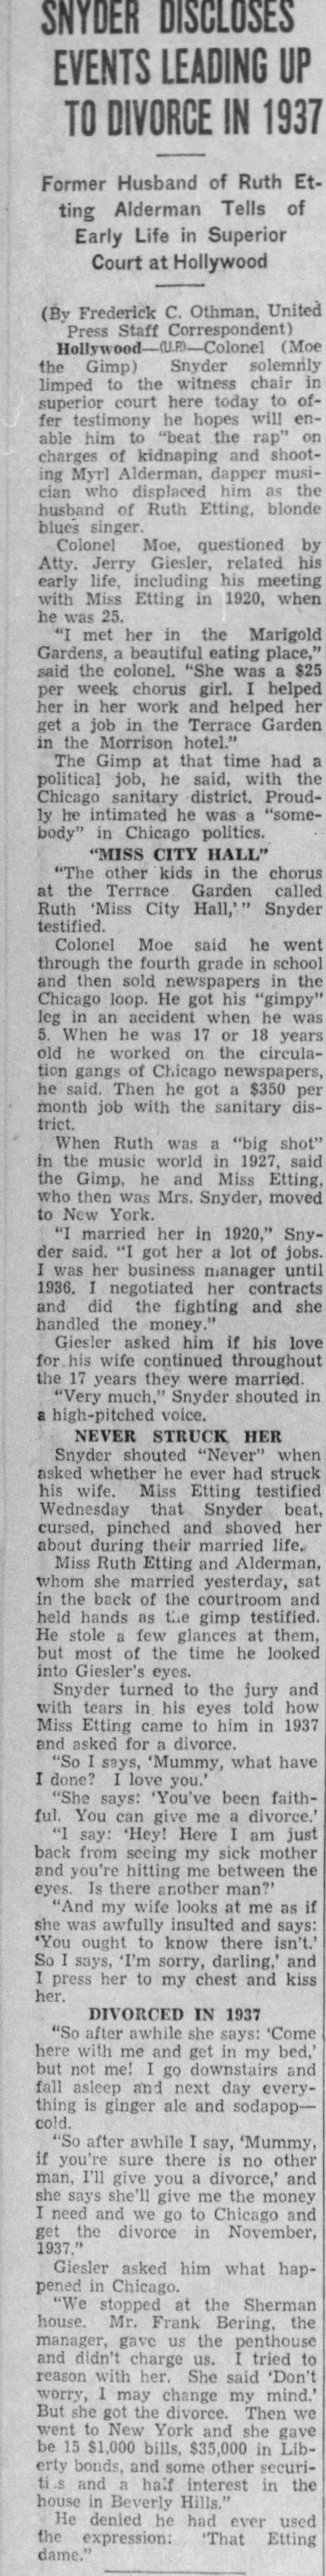 Moe Snyder tells of Etting divorce -